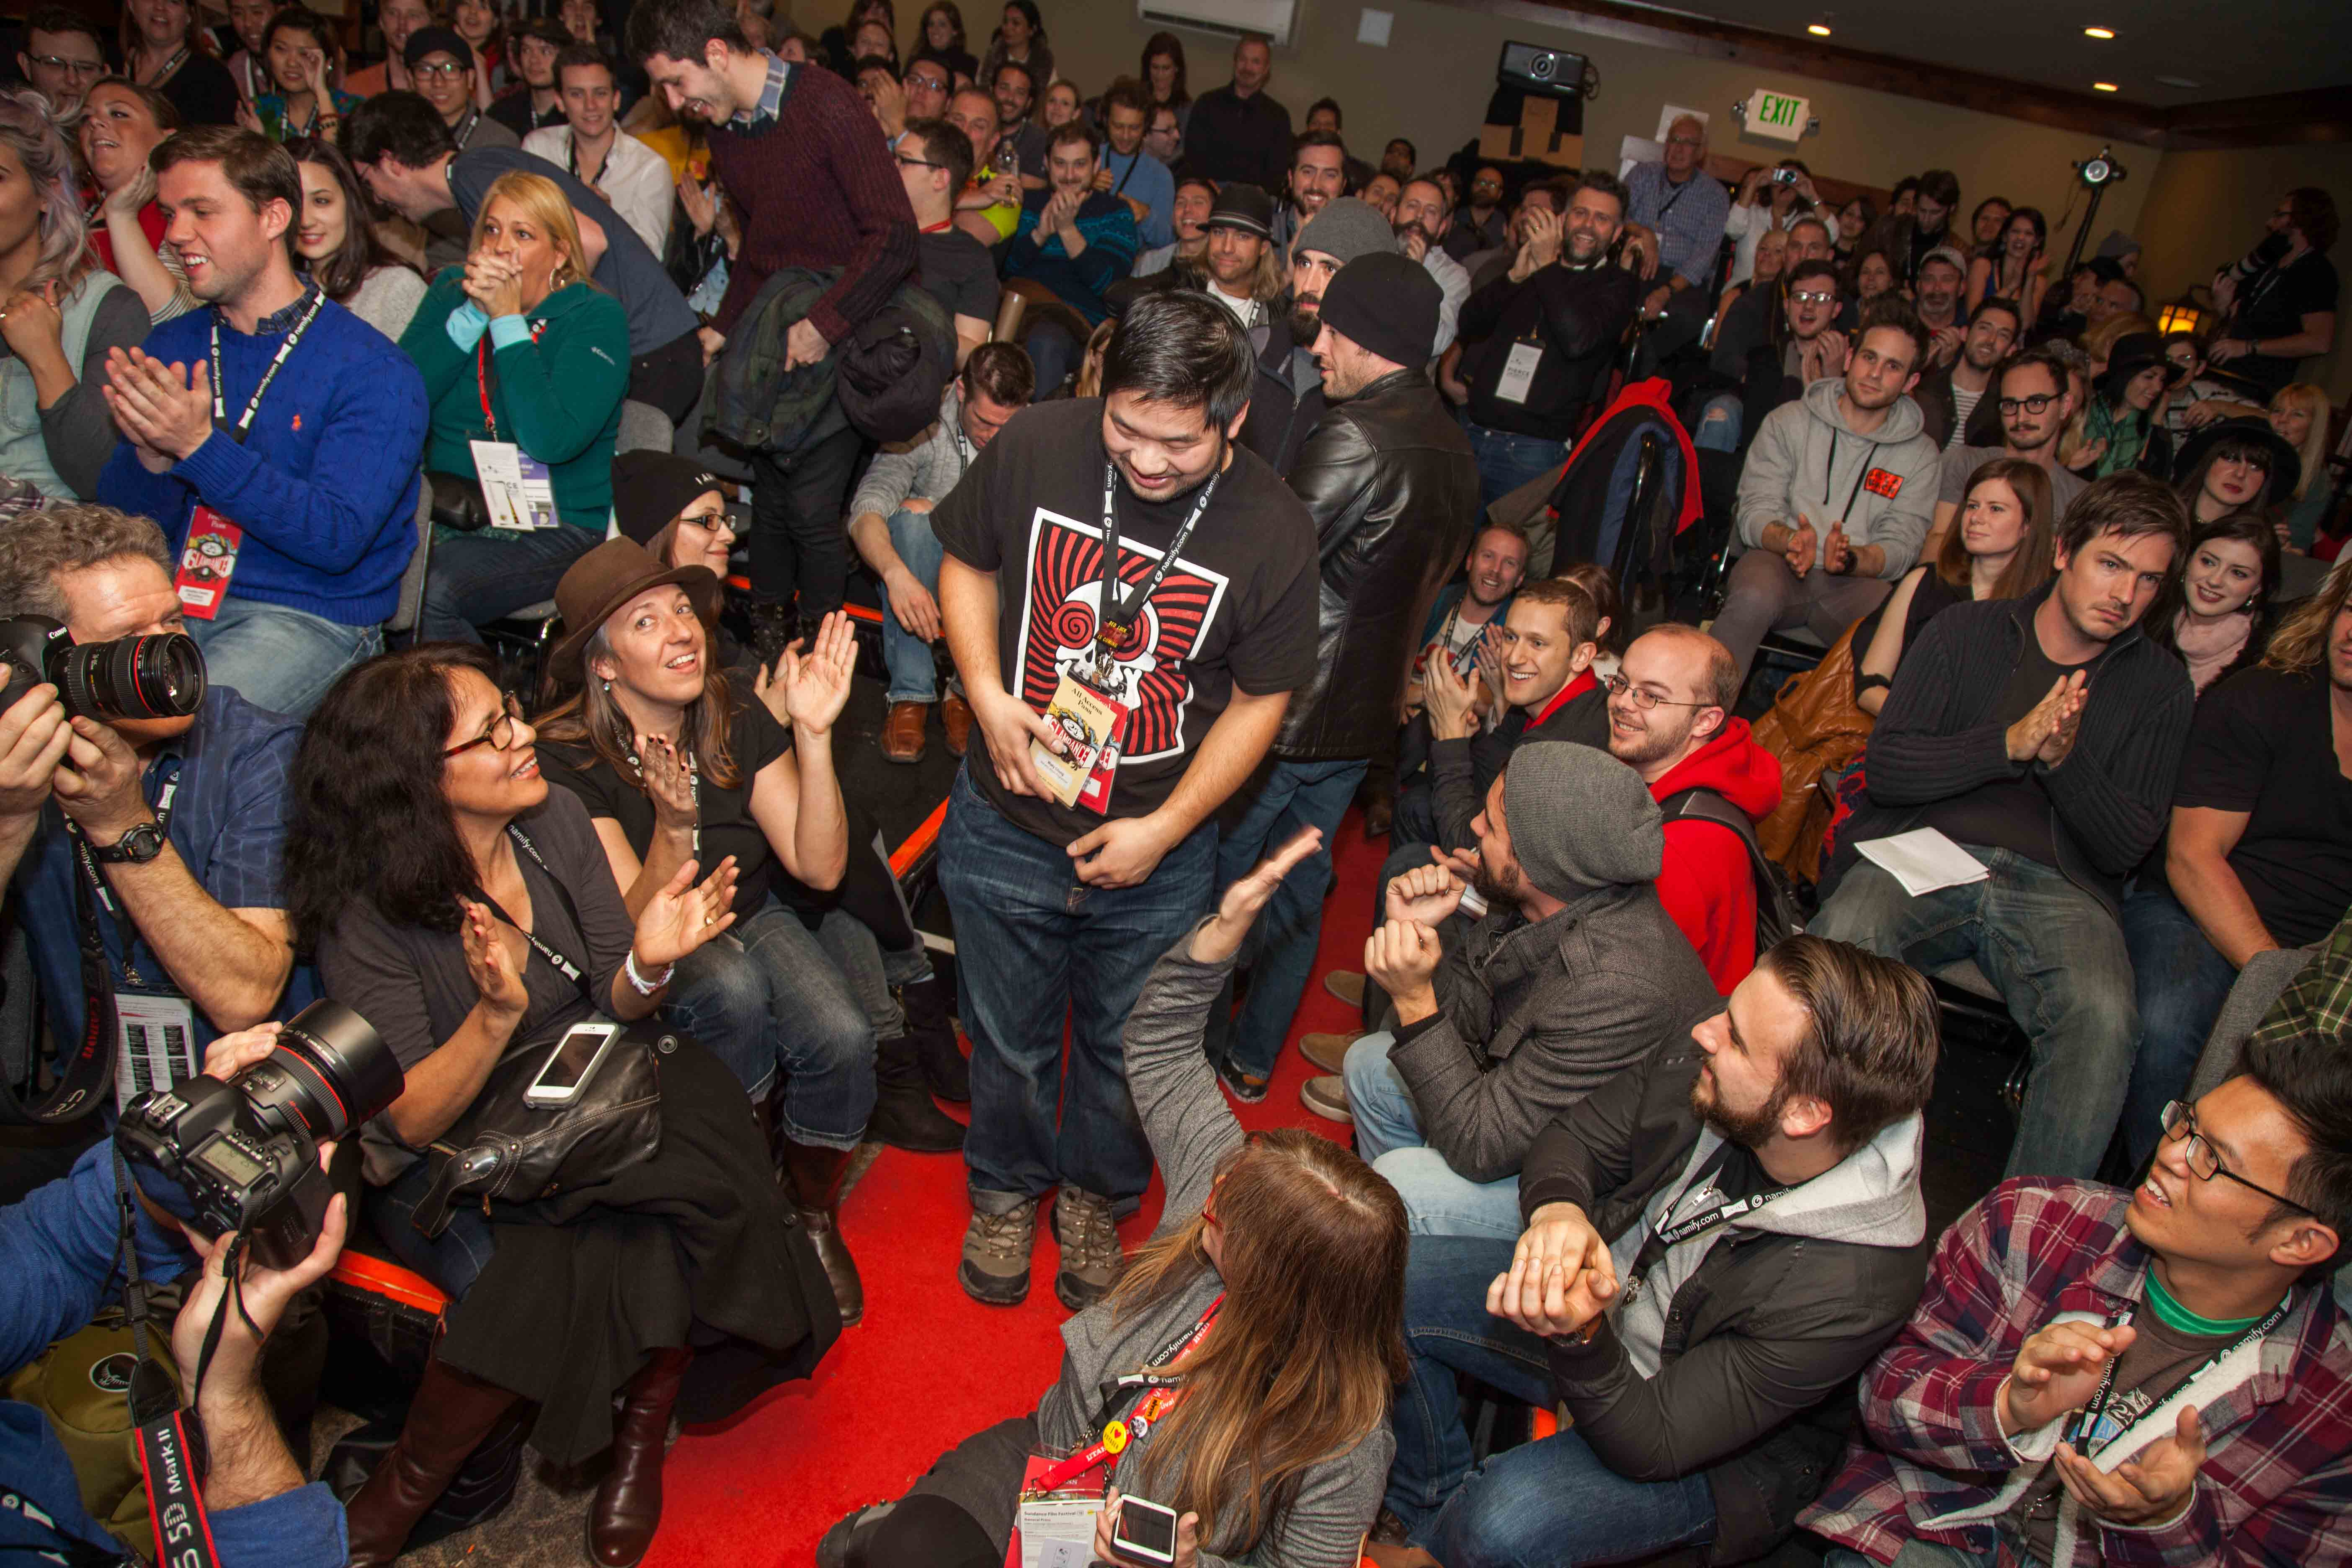 Slamdance Film Festival - Wikipedia